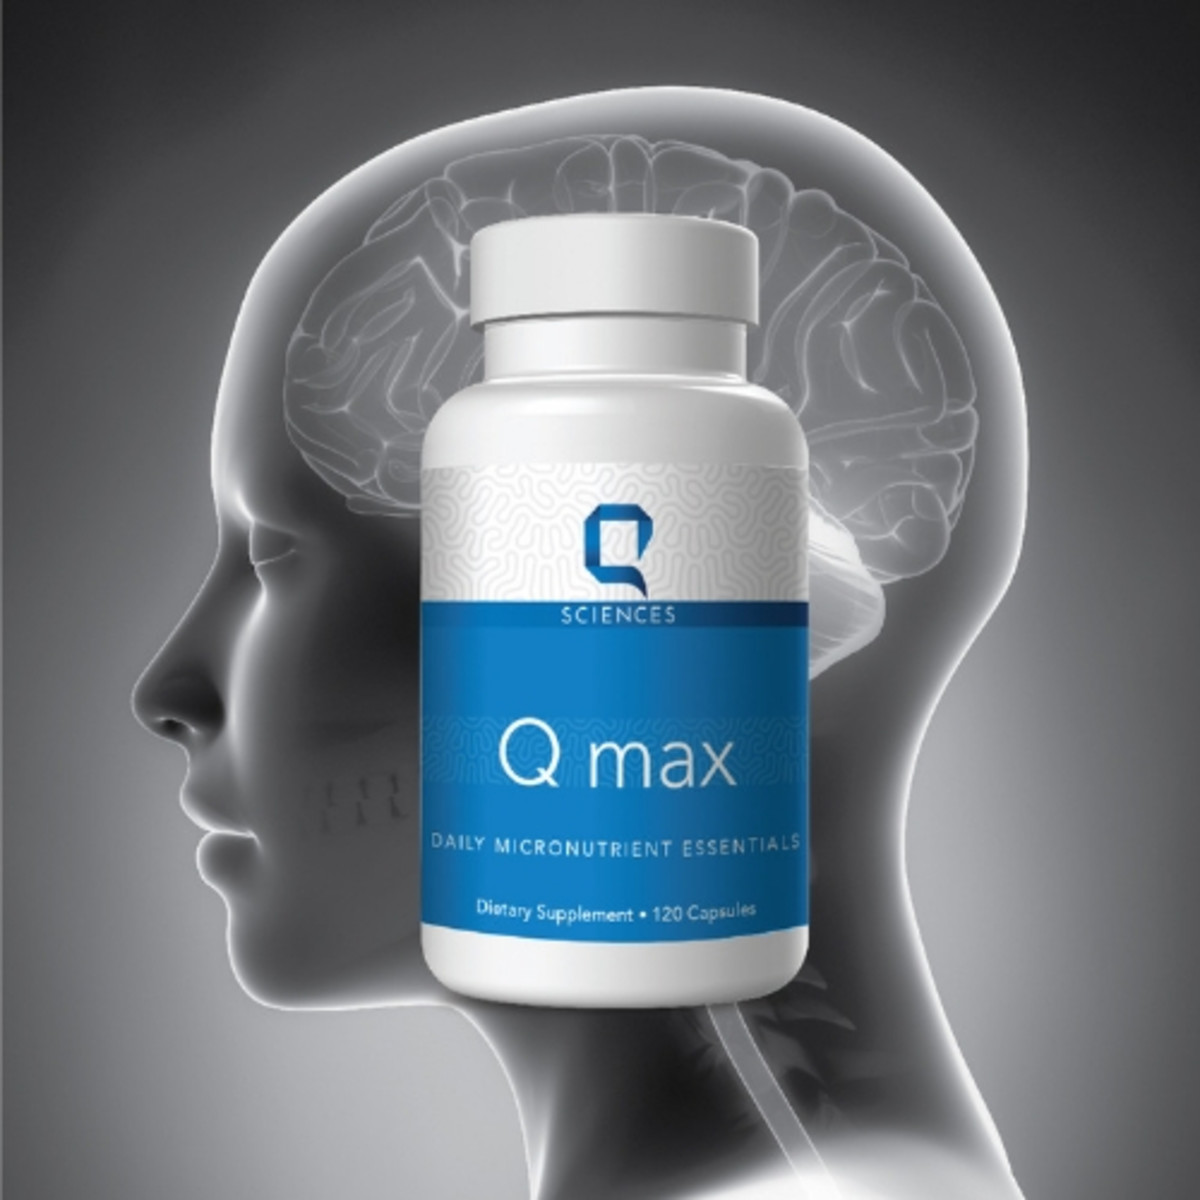 q max micronutrients